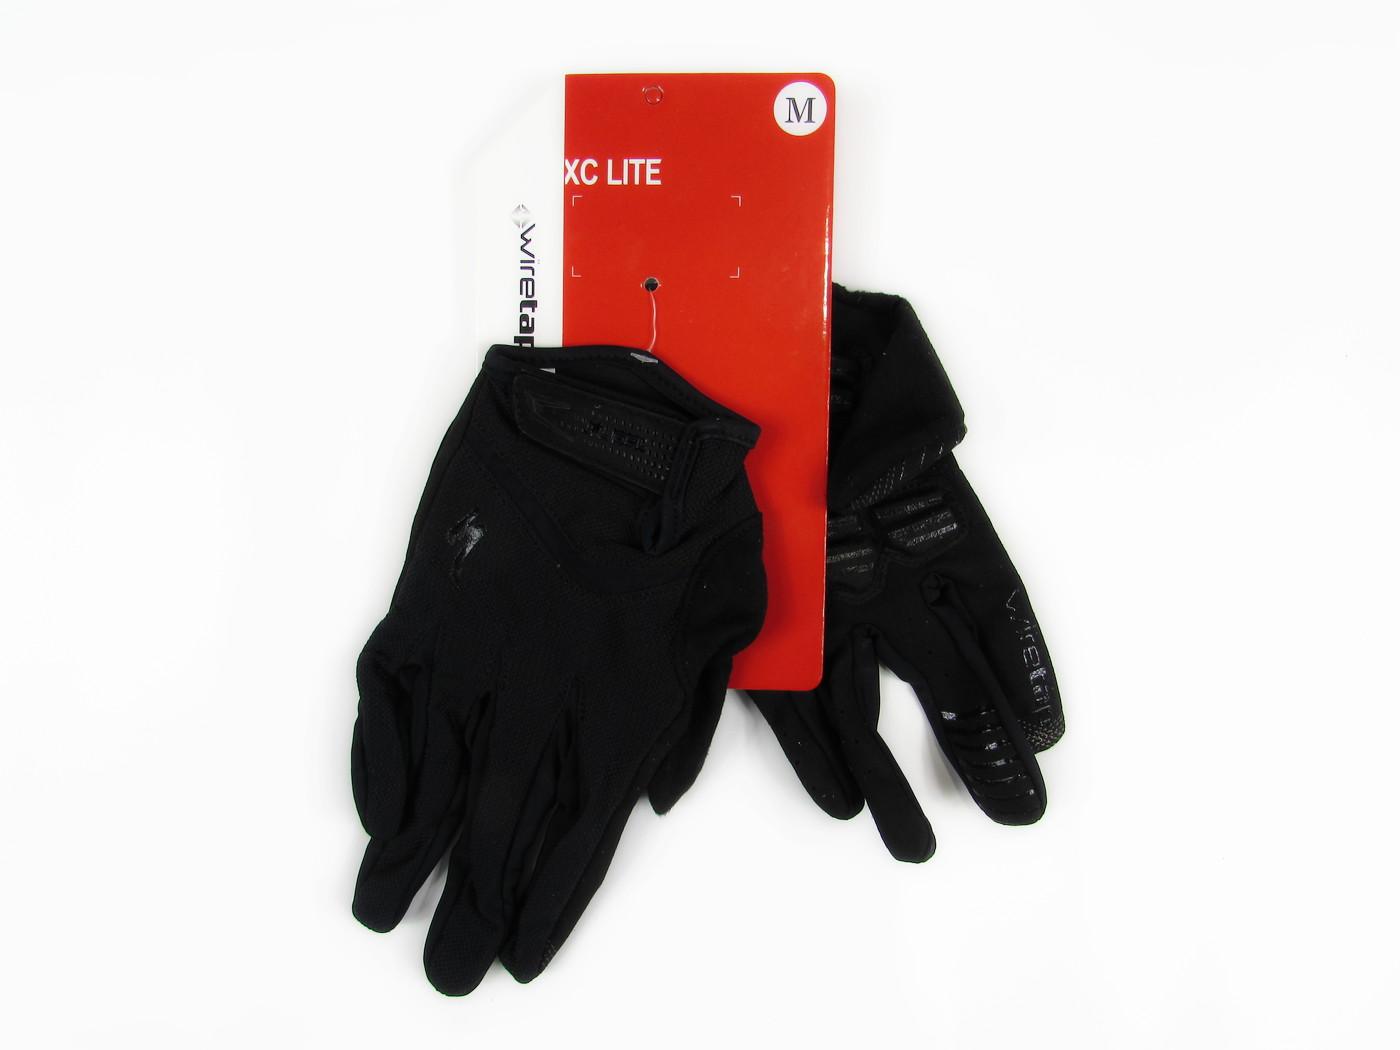 Specialized Gloves Black